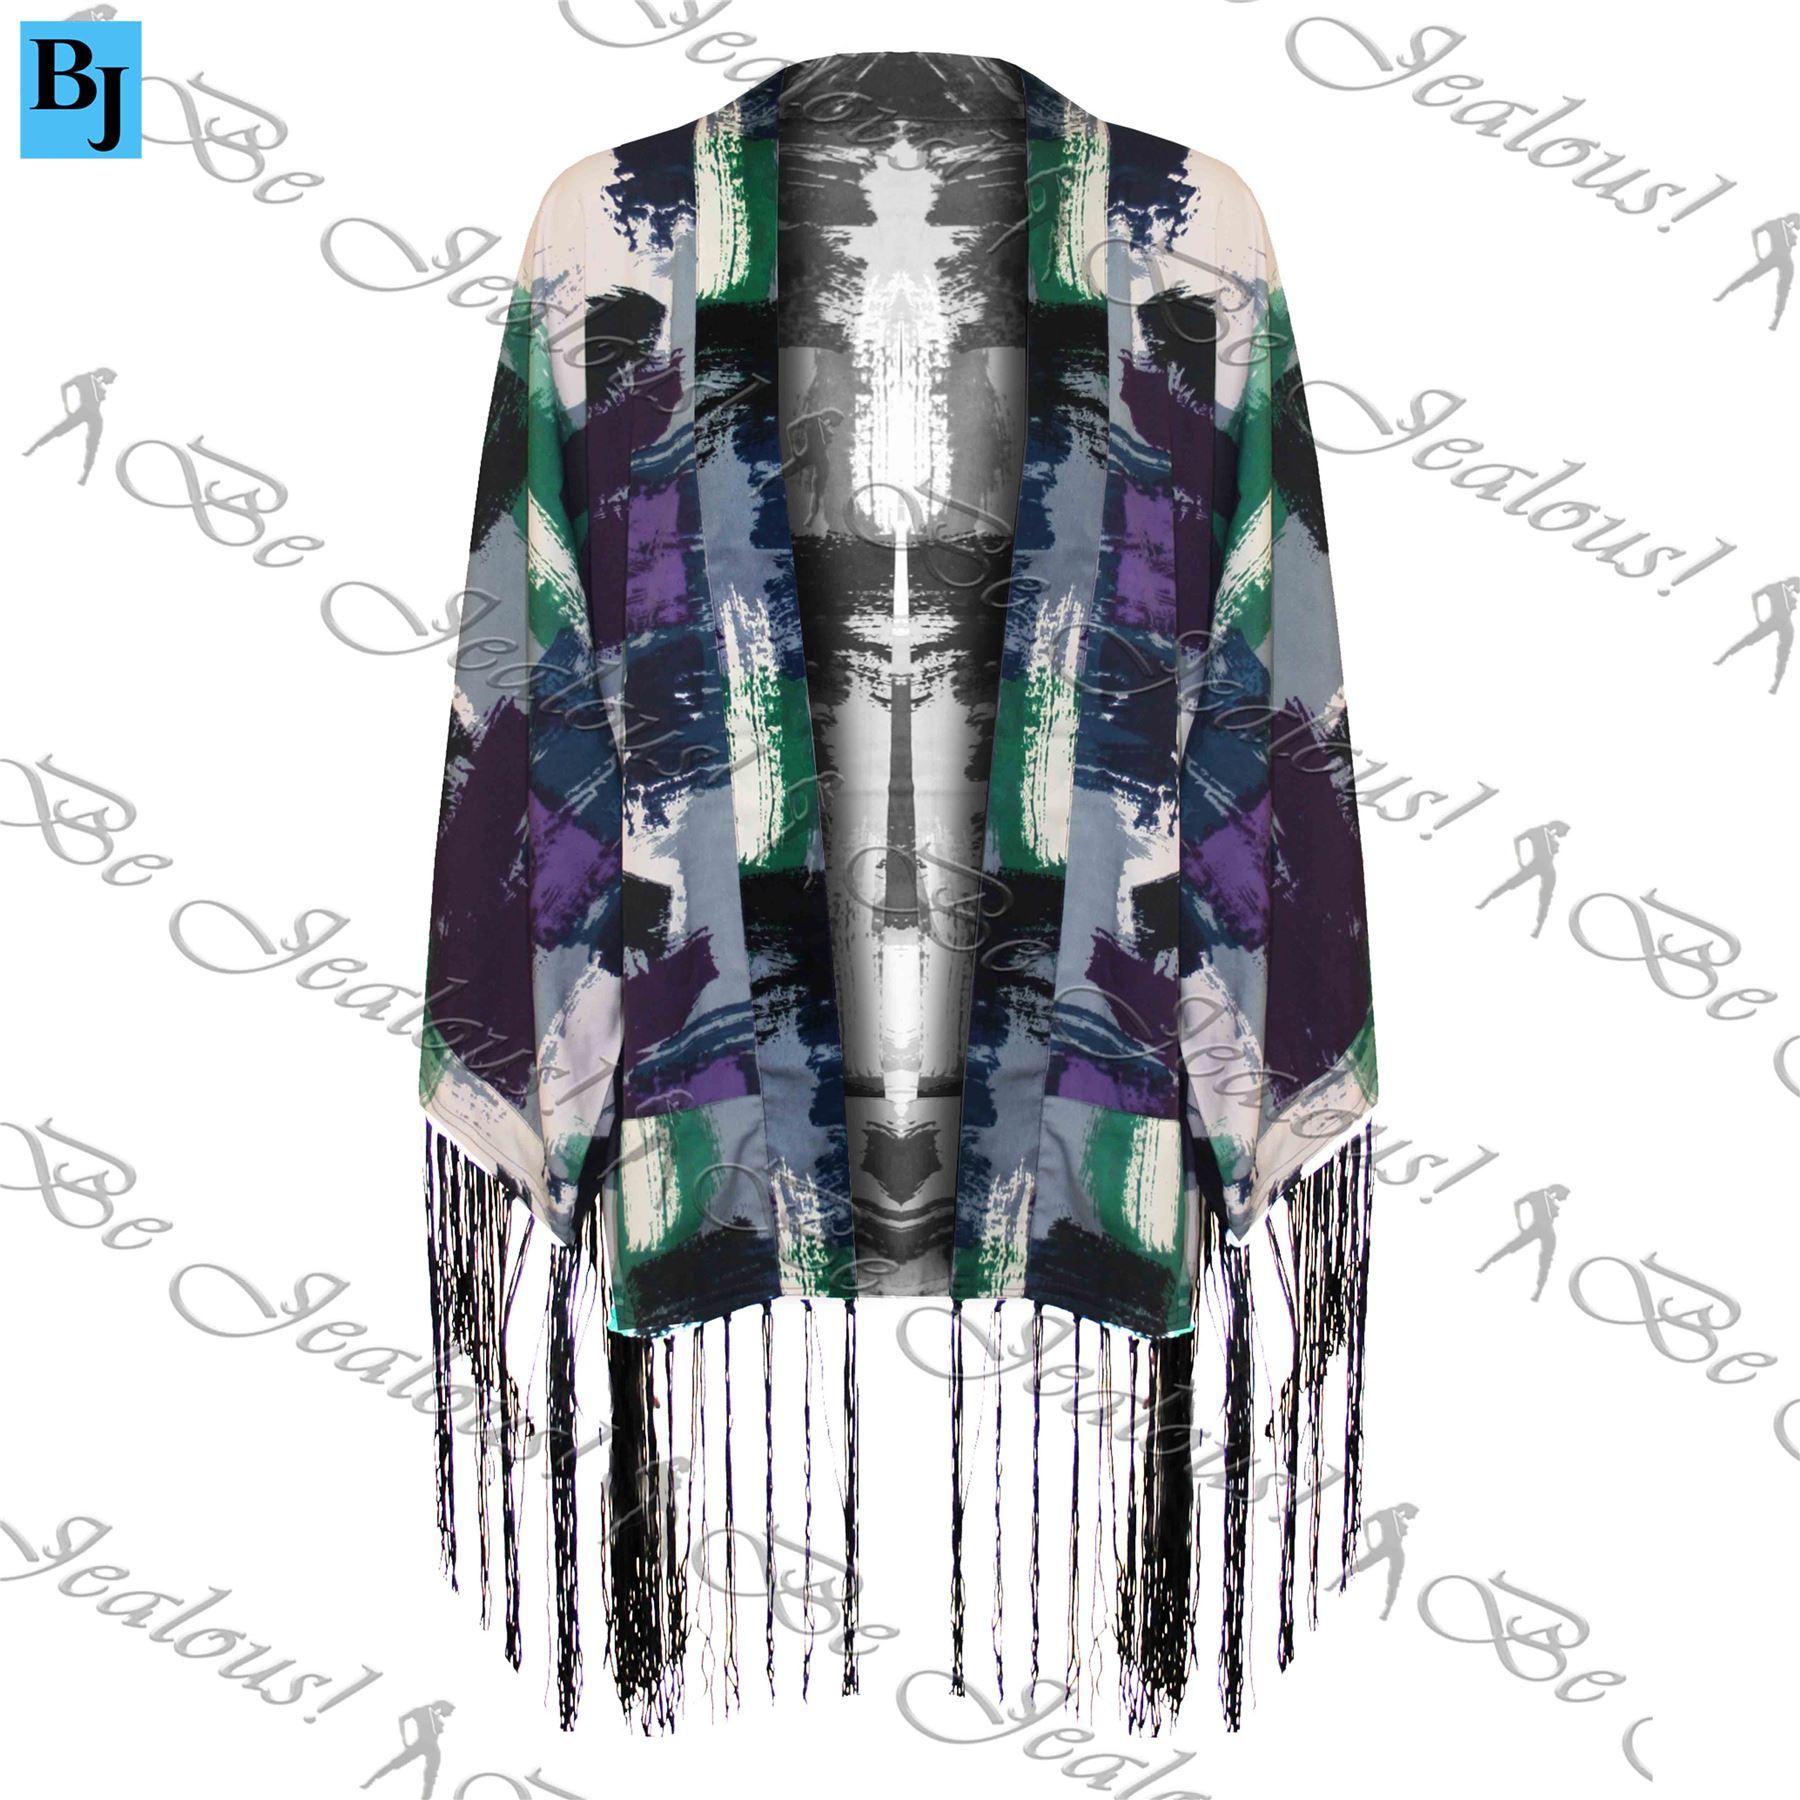 Femme-kimono-retro-vintage-hippie-retro-veste-ample-manteau-blazer-fit-top